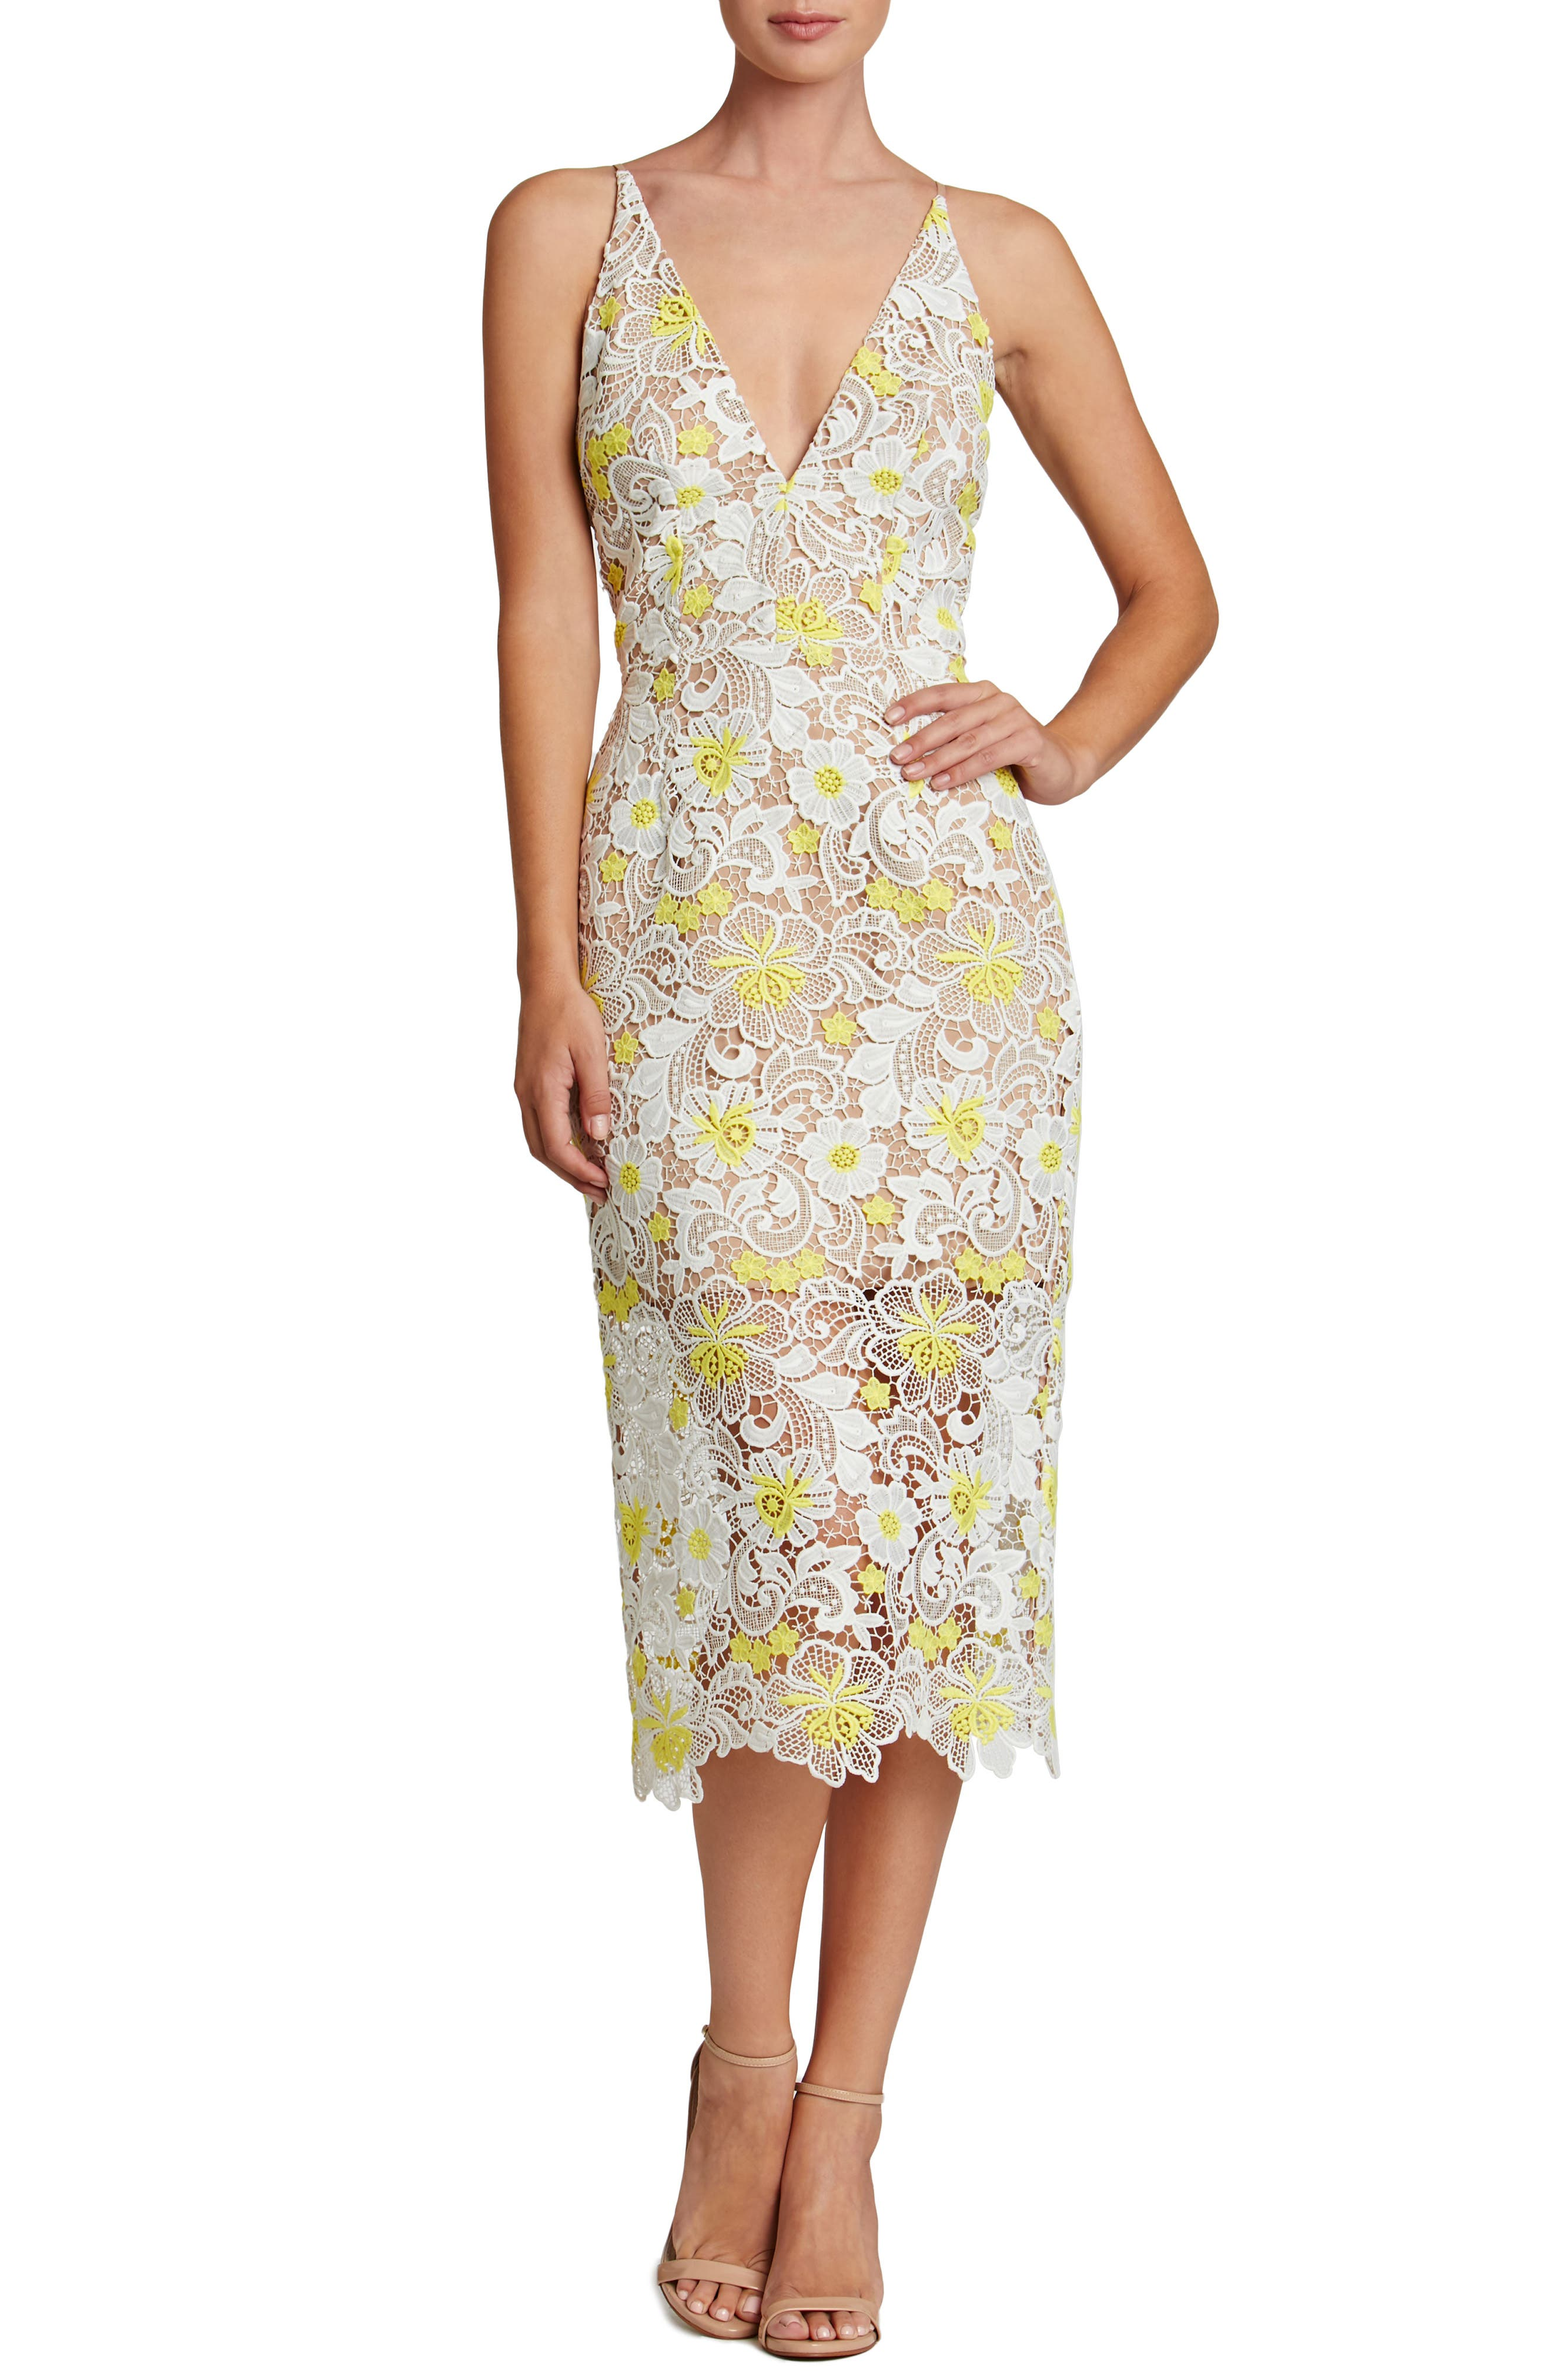 Aurora Floral Midi Dress,                         Main,                         color, White/ Yellow Floral